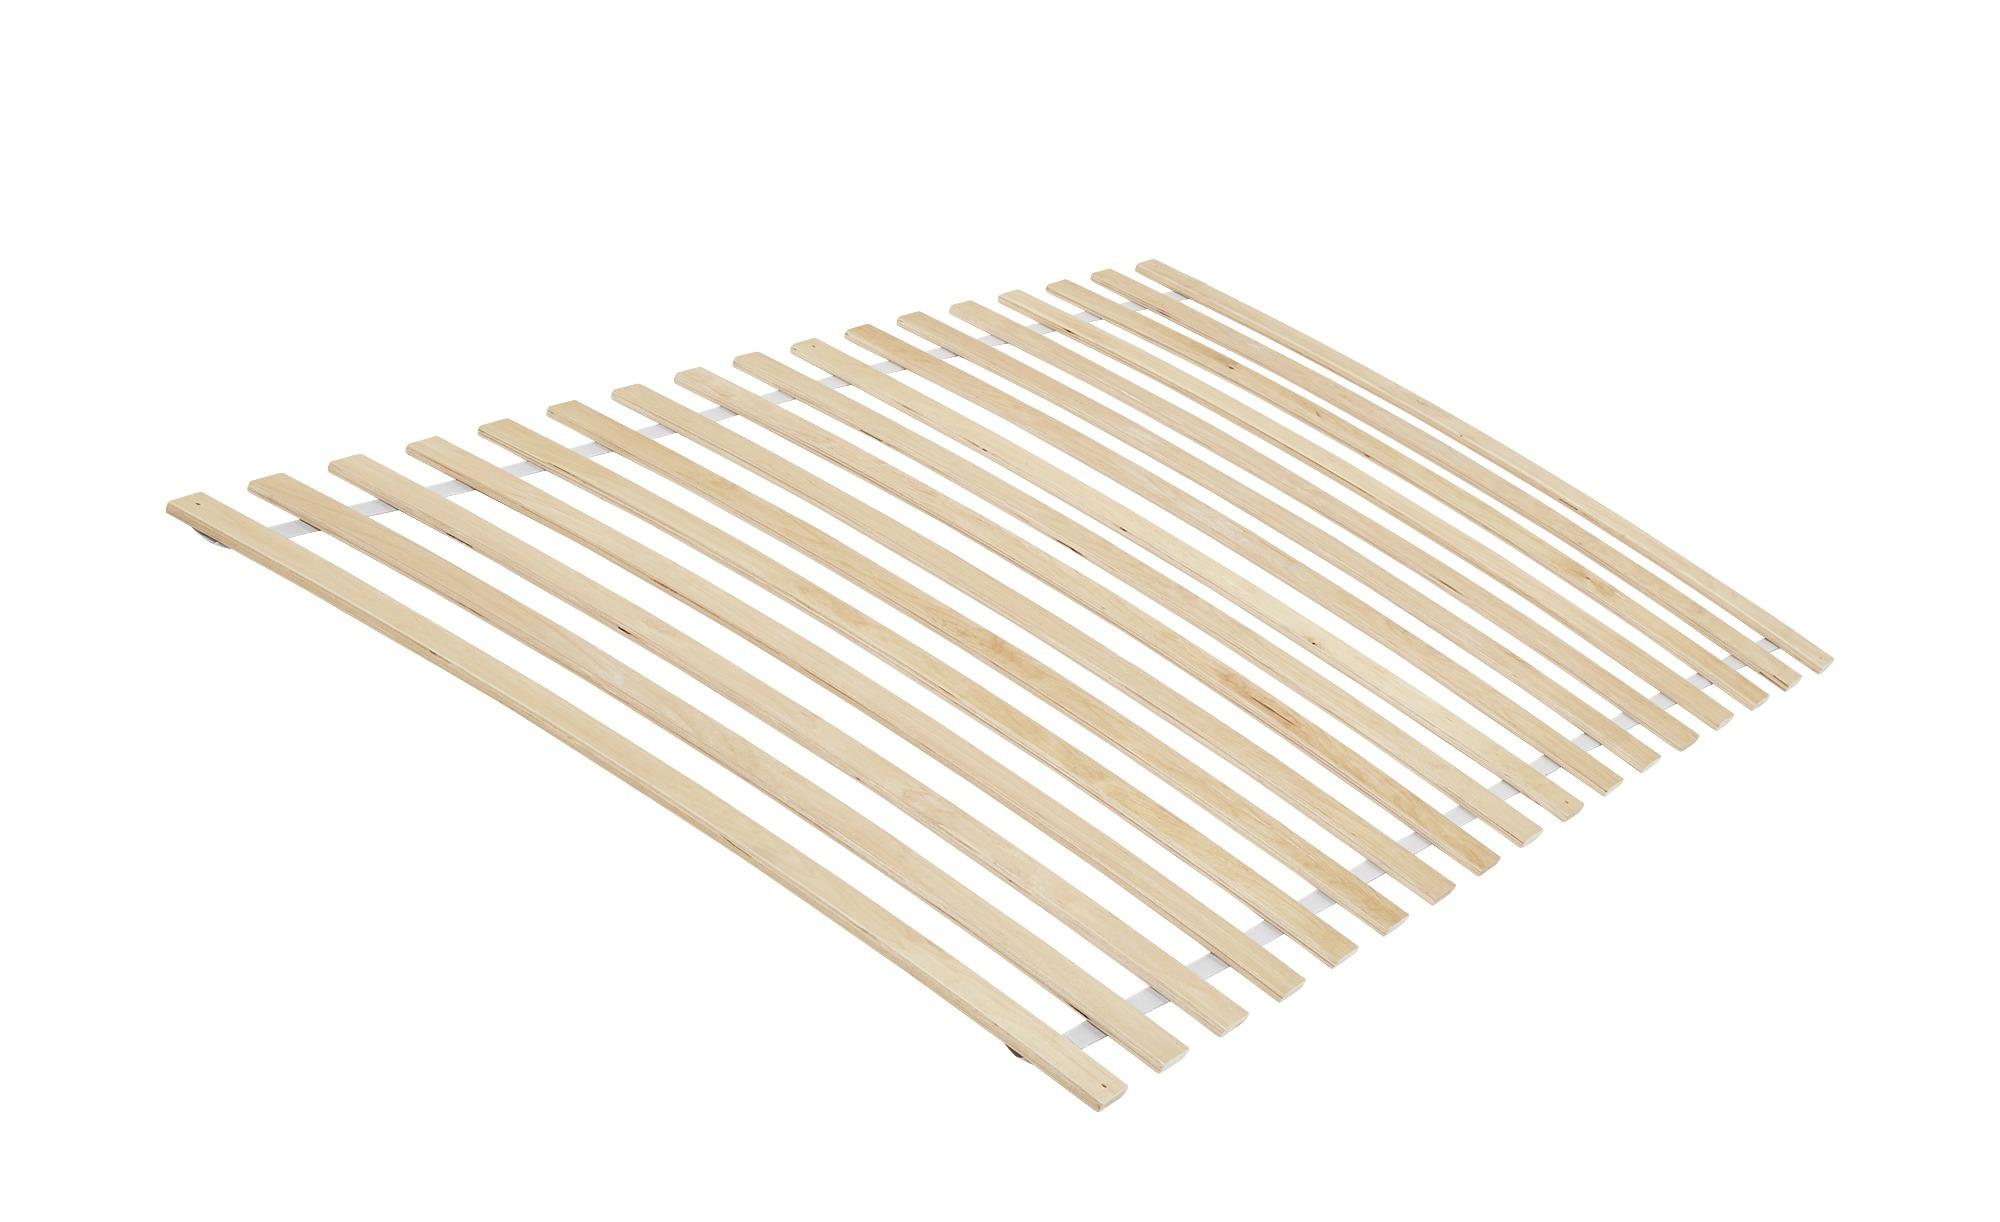 Rollrost - holzfarben - Matratzen & Lattenroste > Lattenroste > Lattenroste starr - Möbel Kraft | Schlafzimmer > Lattenroste > Rollroste | Möbel Kraft